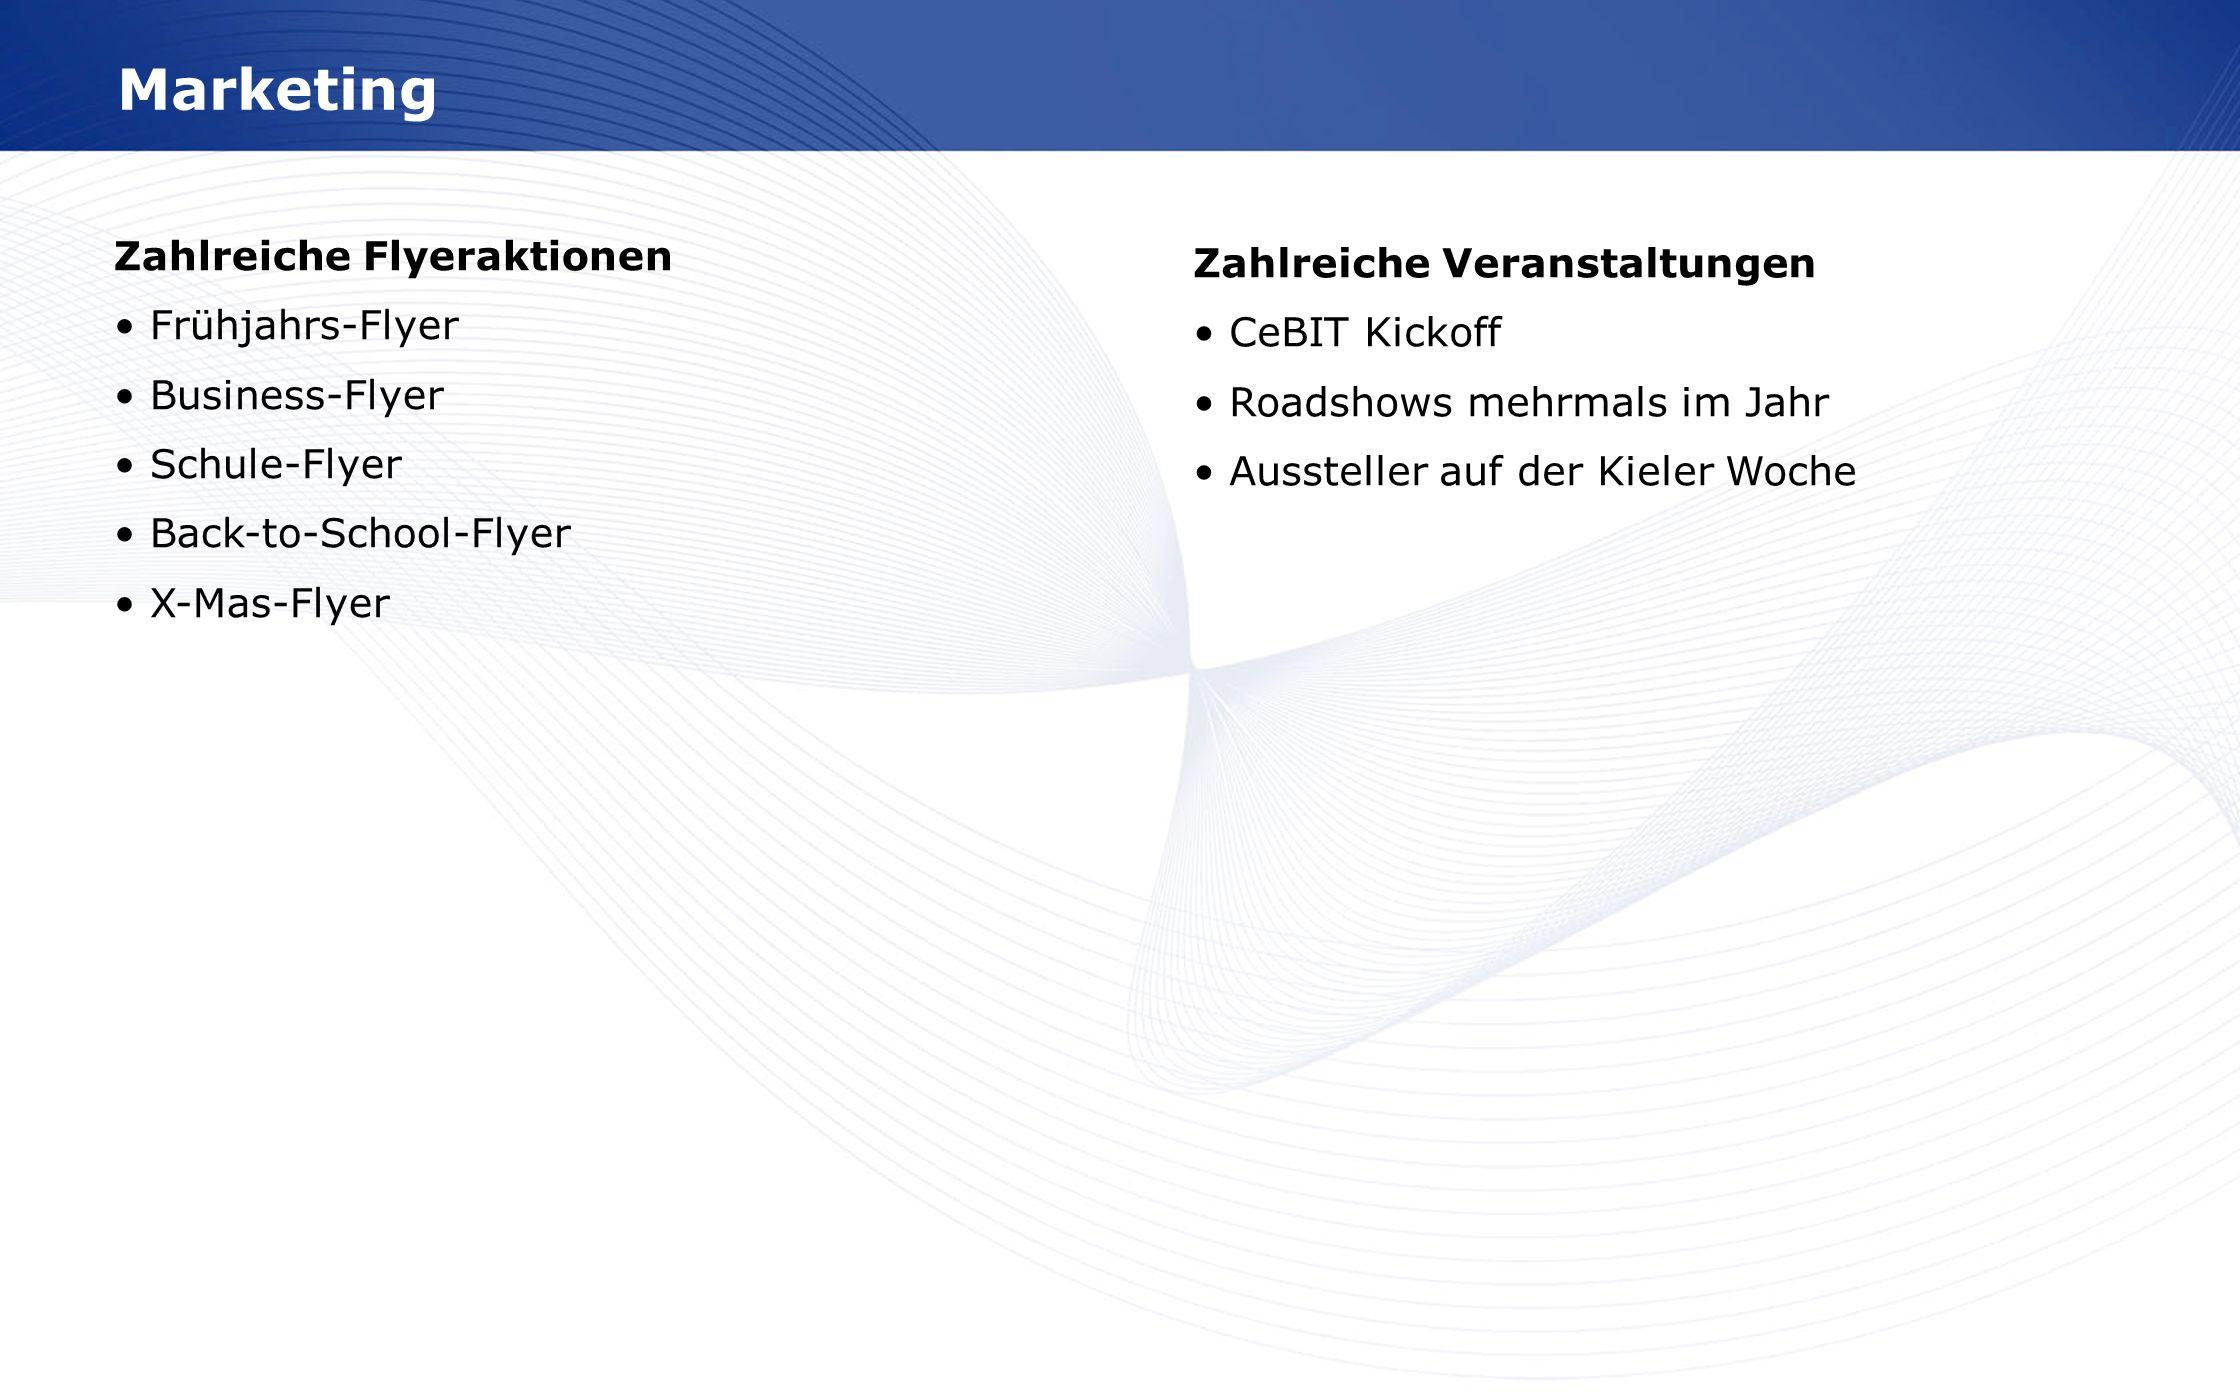 www.wortmann.de Marketing Zahlreiche Flyeraktionen Frühjahrs-Flyer Business-Flyer Schule-Flyer Back-to-School-Flyer X-Mas-Flyer Zahlreiche Veranstaltu